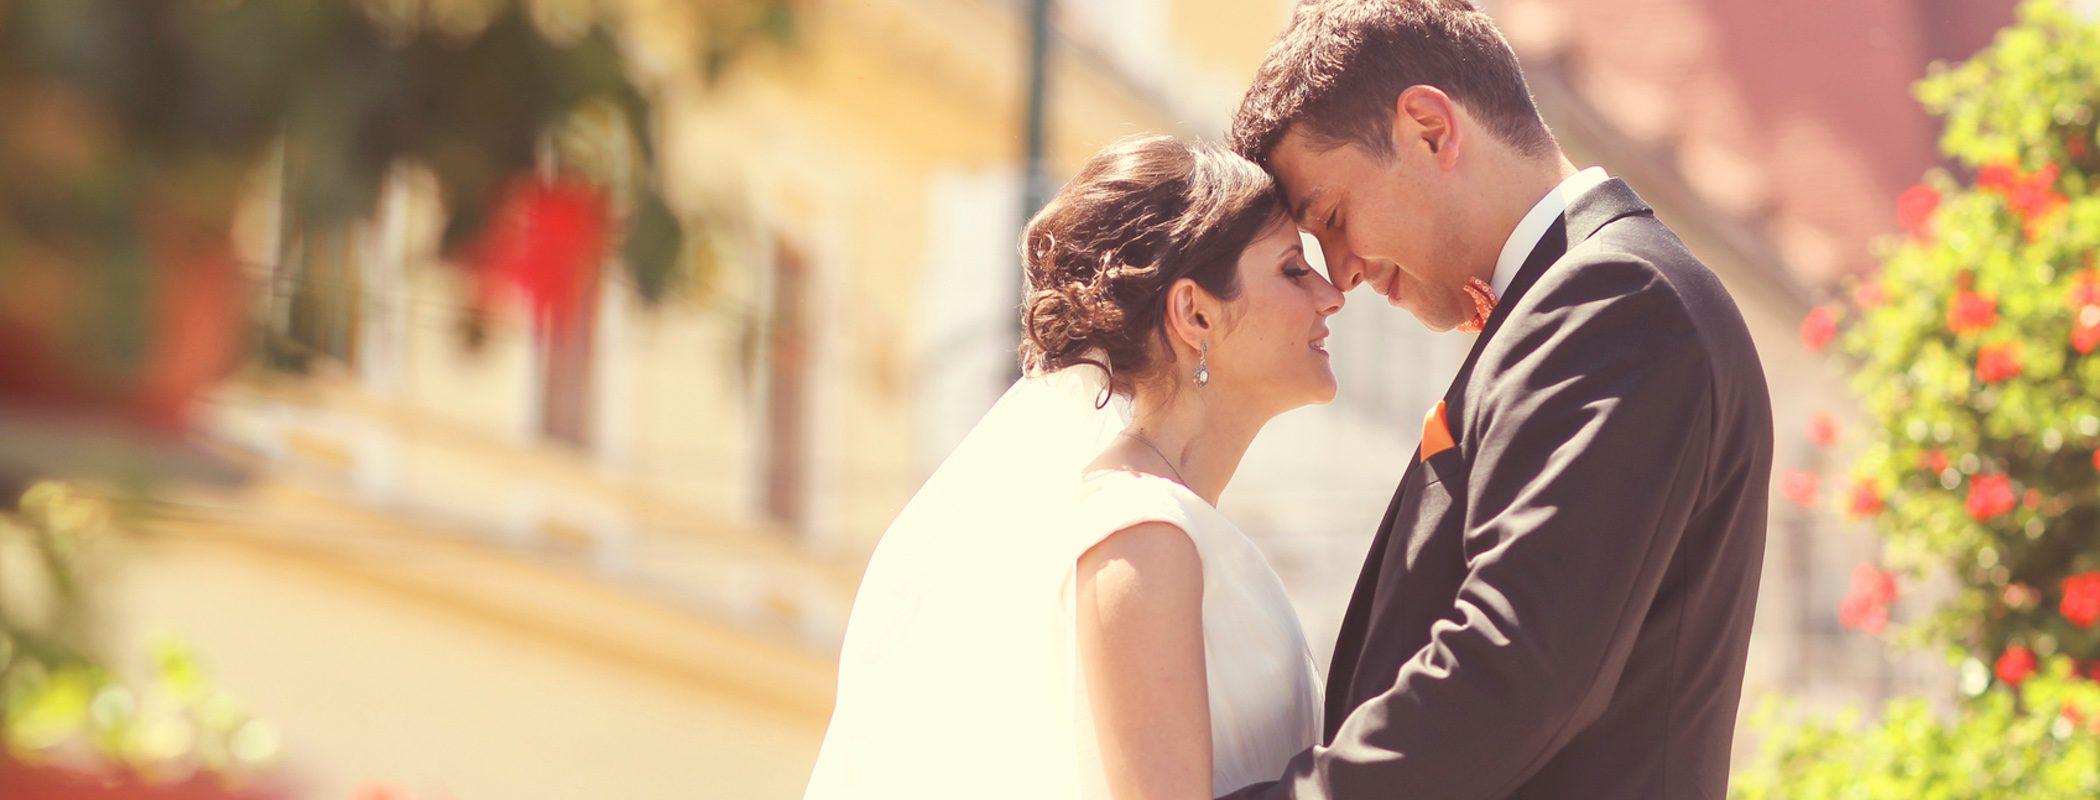 Ventajas e inconvenientes de casarse por la Iglesia